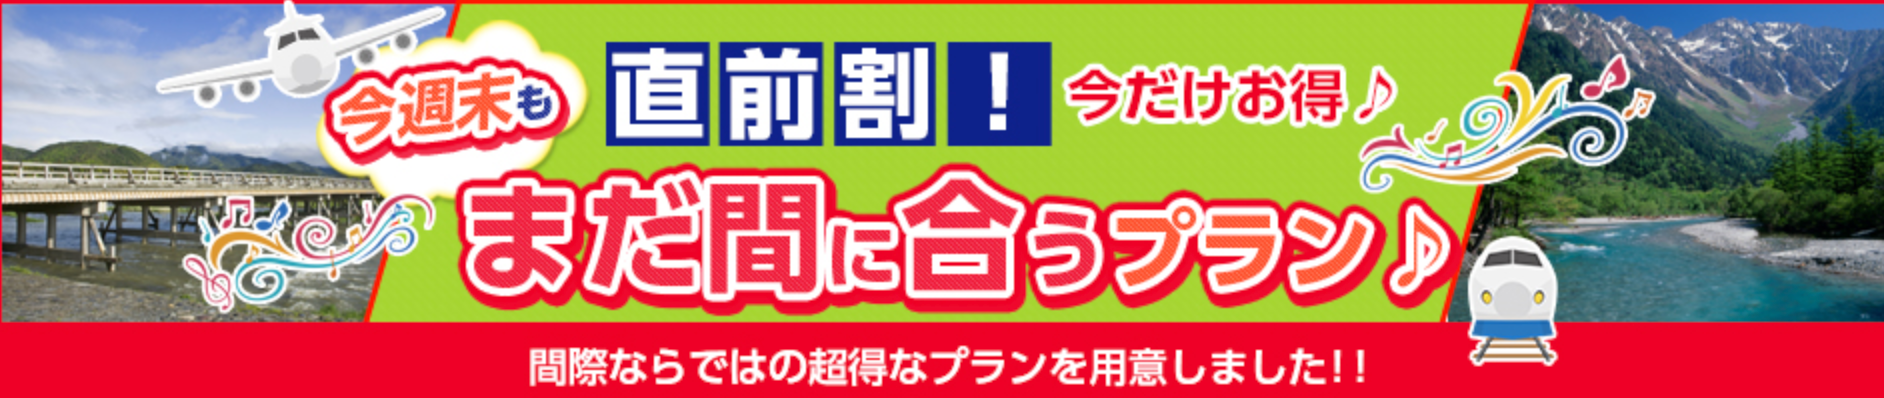 日本旅行の国内旅行予約の直前割引セール